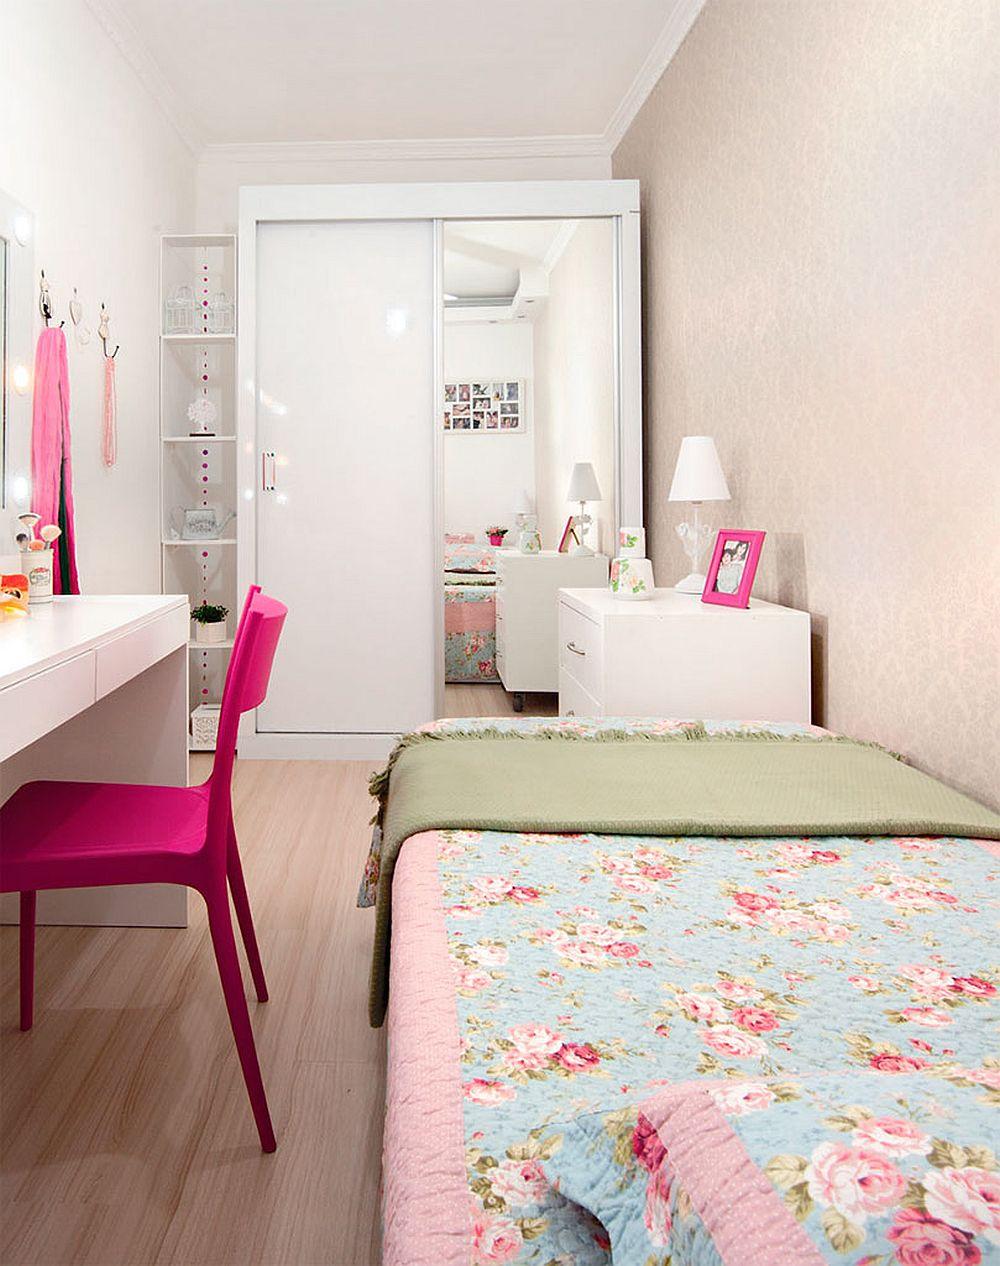 adelaparvu.com despre camera de tineret in 7 mp inainte si dupa amenajare (4)